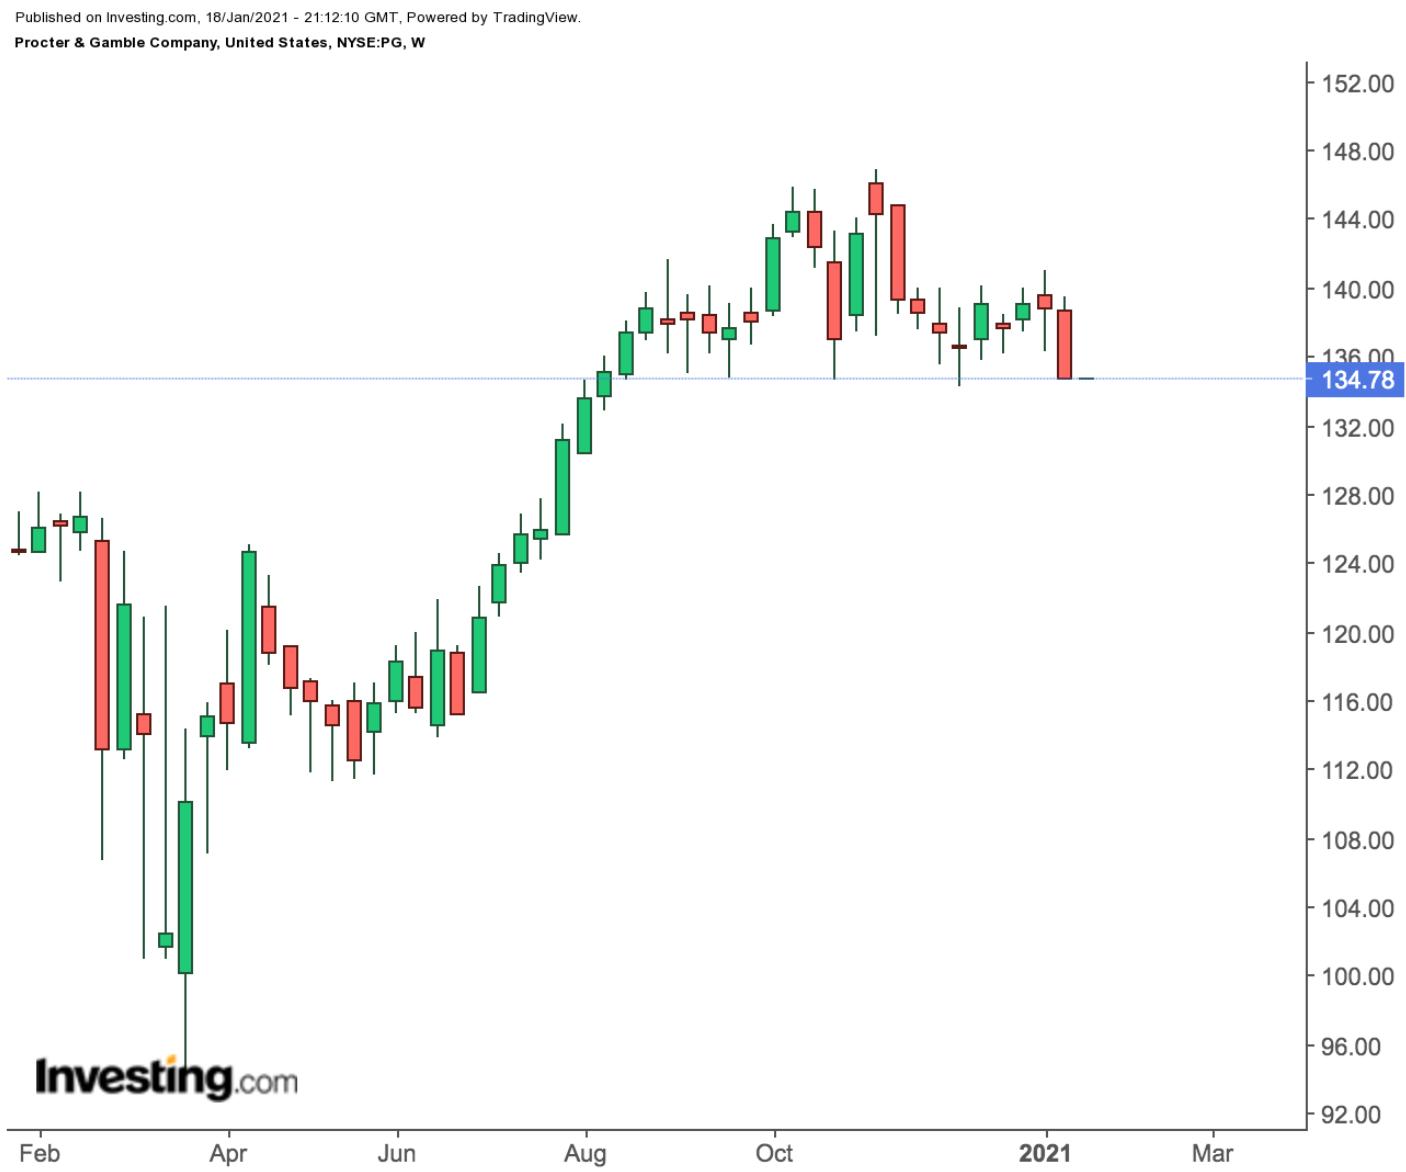 Procter & Gamble Weekly Chart.